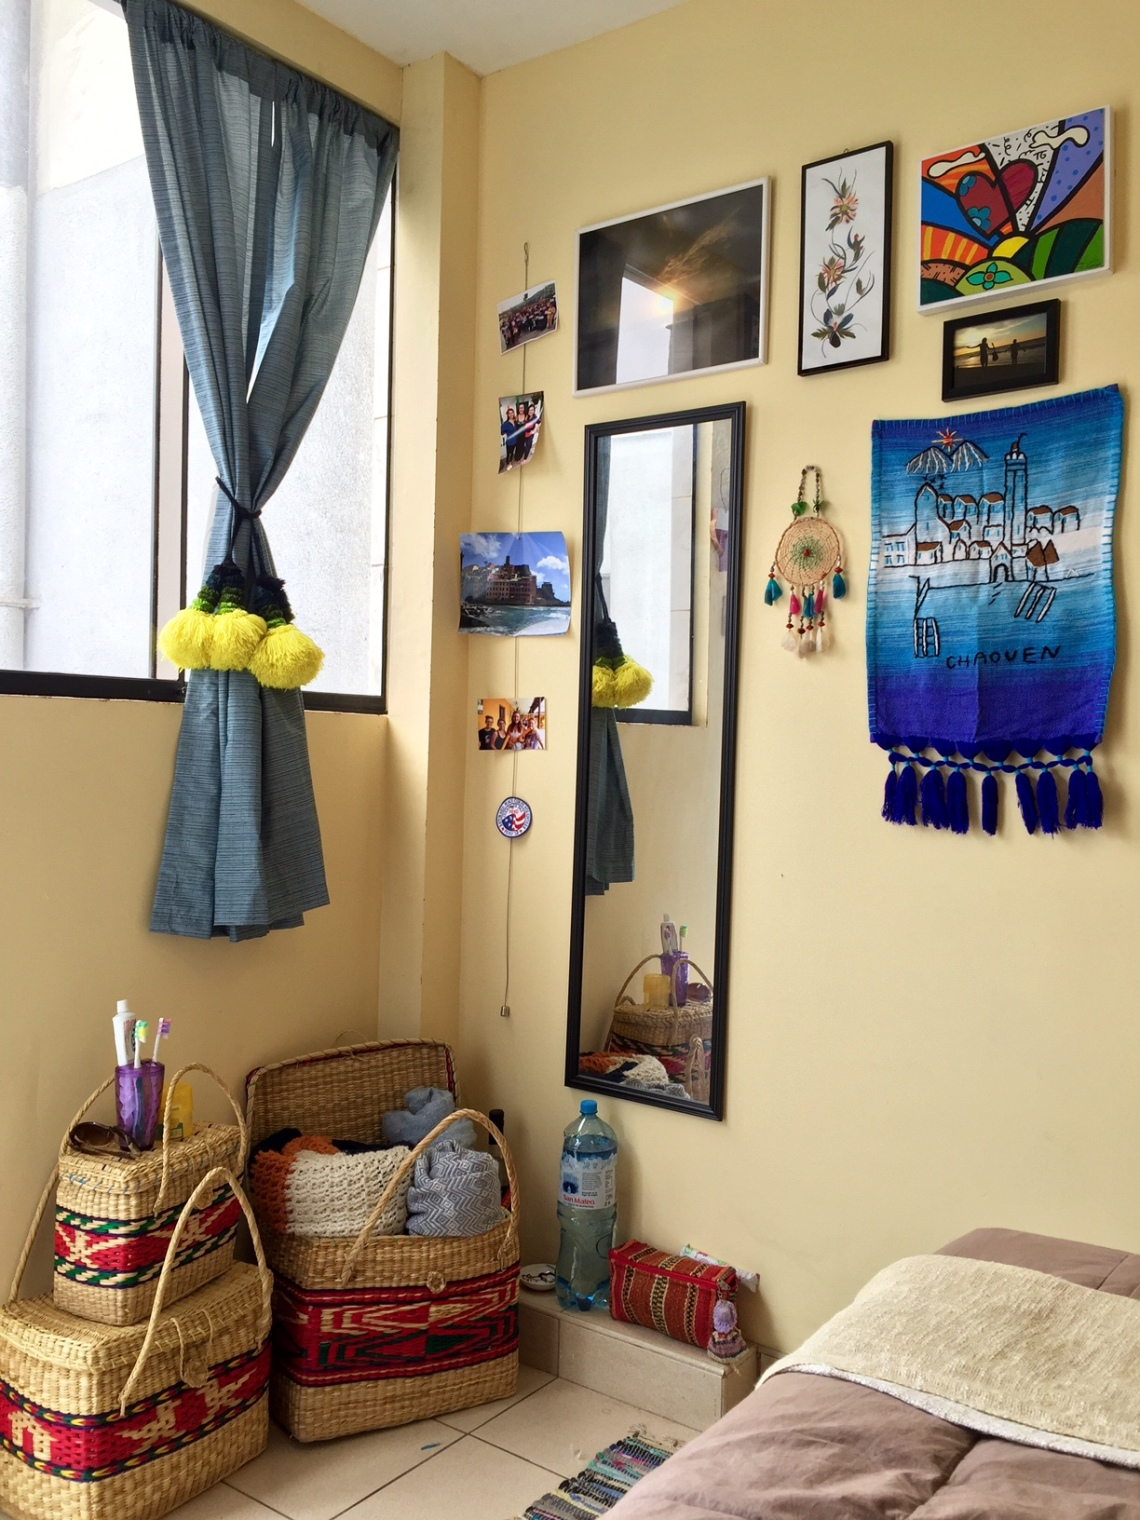 Peace Corps Peru Volunteer Room DIY Decor Cribs 2